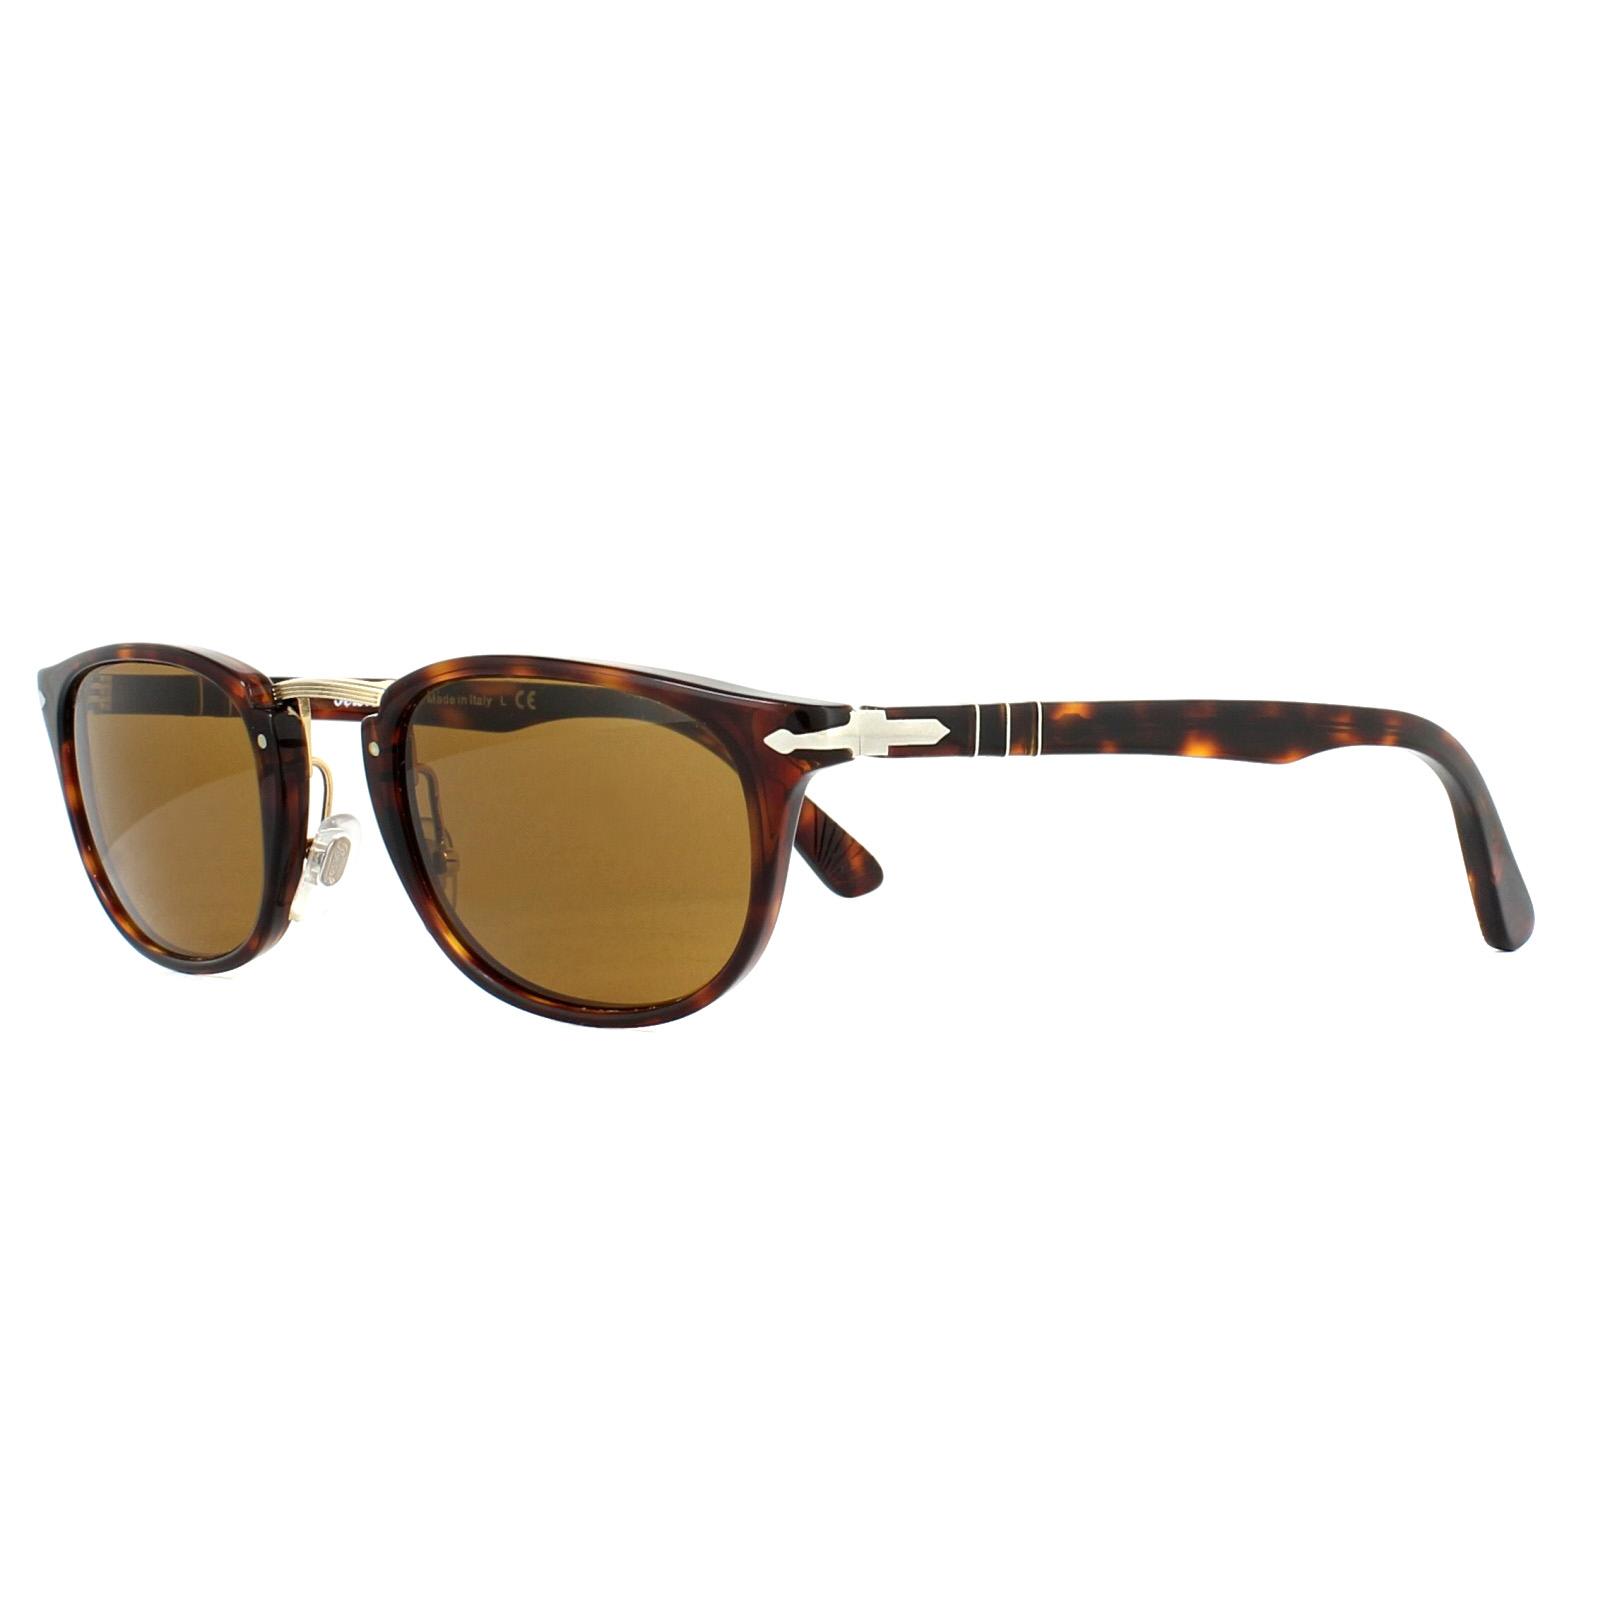 ba699a33145 Persol Sunglasses 3127S 24 33 Havana Brown 8053672472684